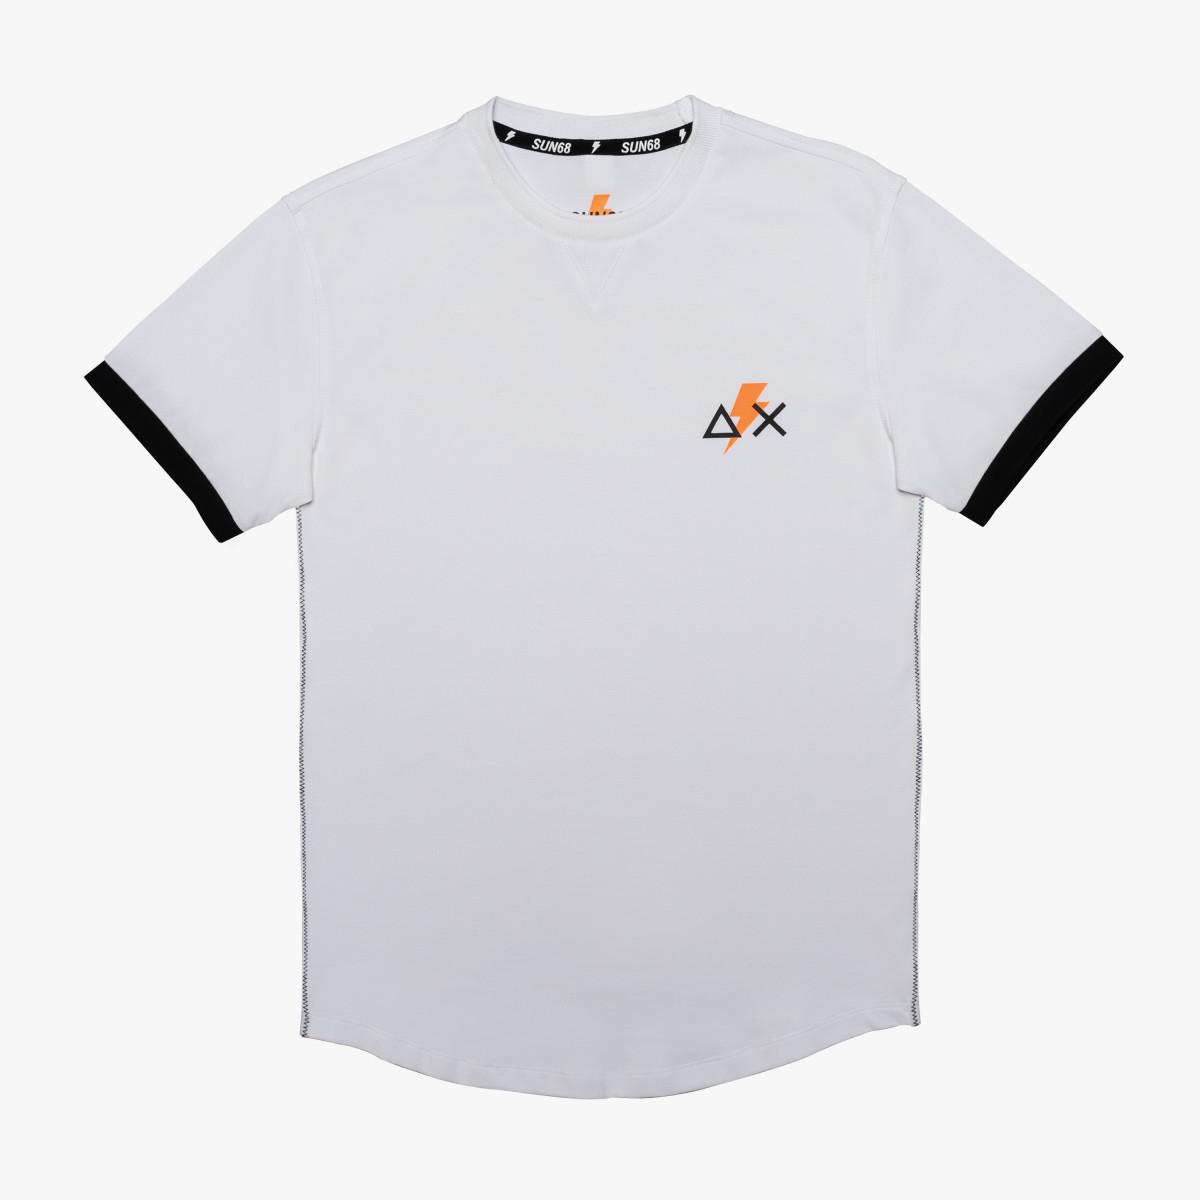 T-SHIRT ROUND NECK S/S WHITE